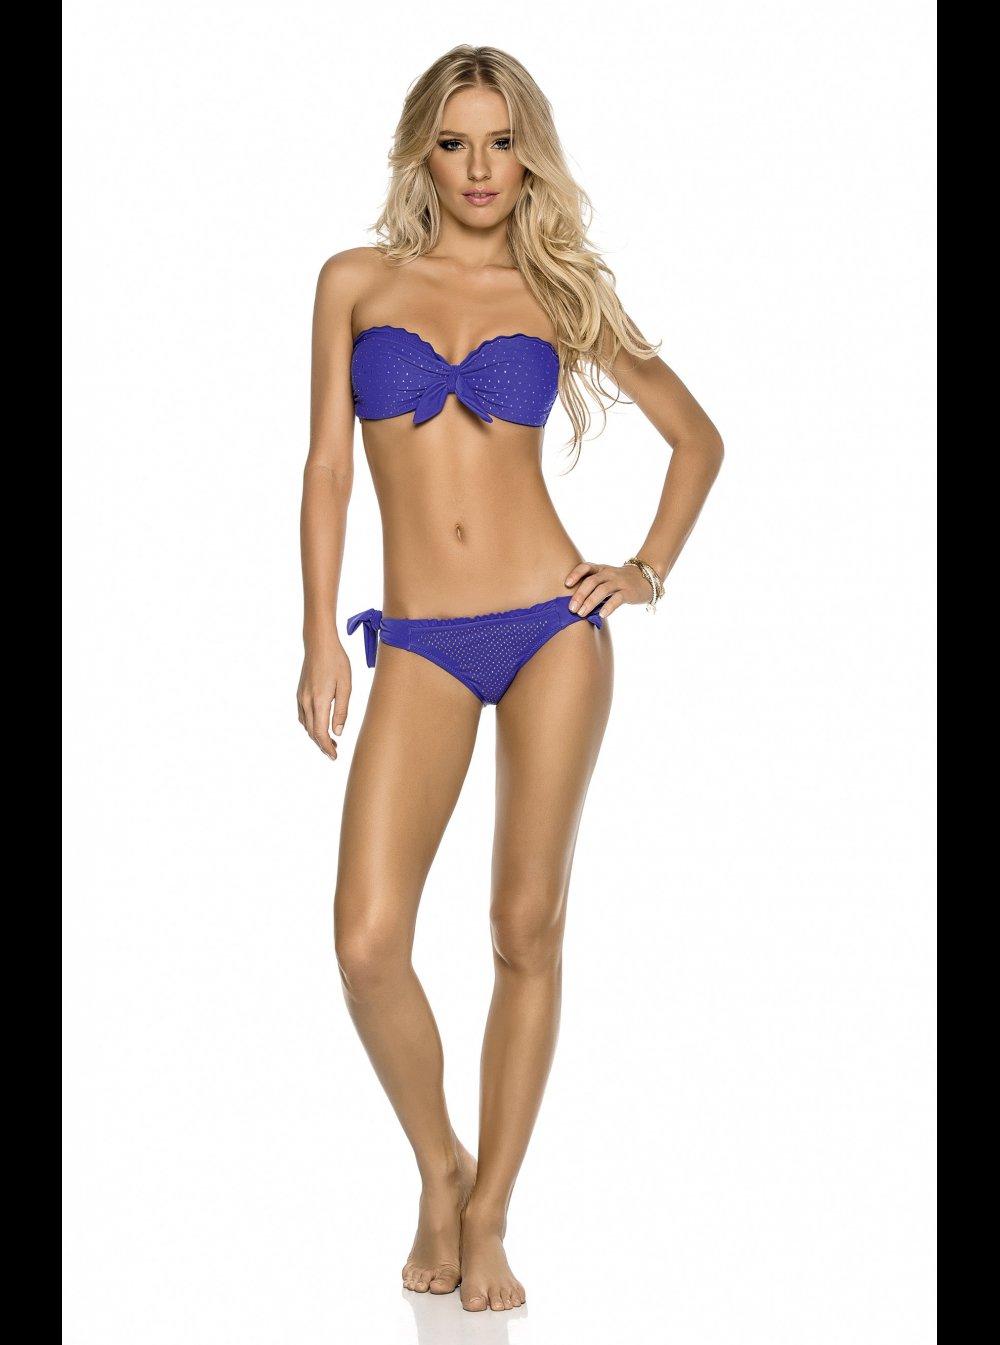 536d6e8620a1 PHAX Swimwear PHAX - Mare - Blueberry Shimmer - Bandeau Bikini